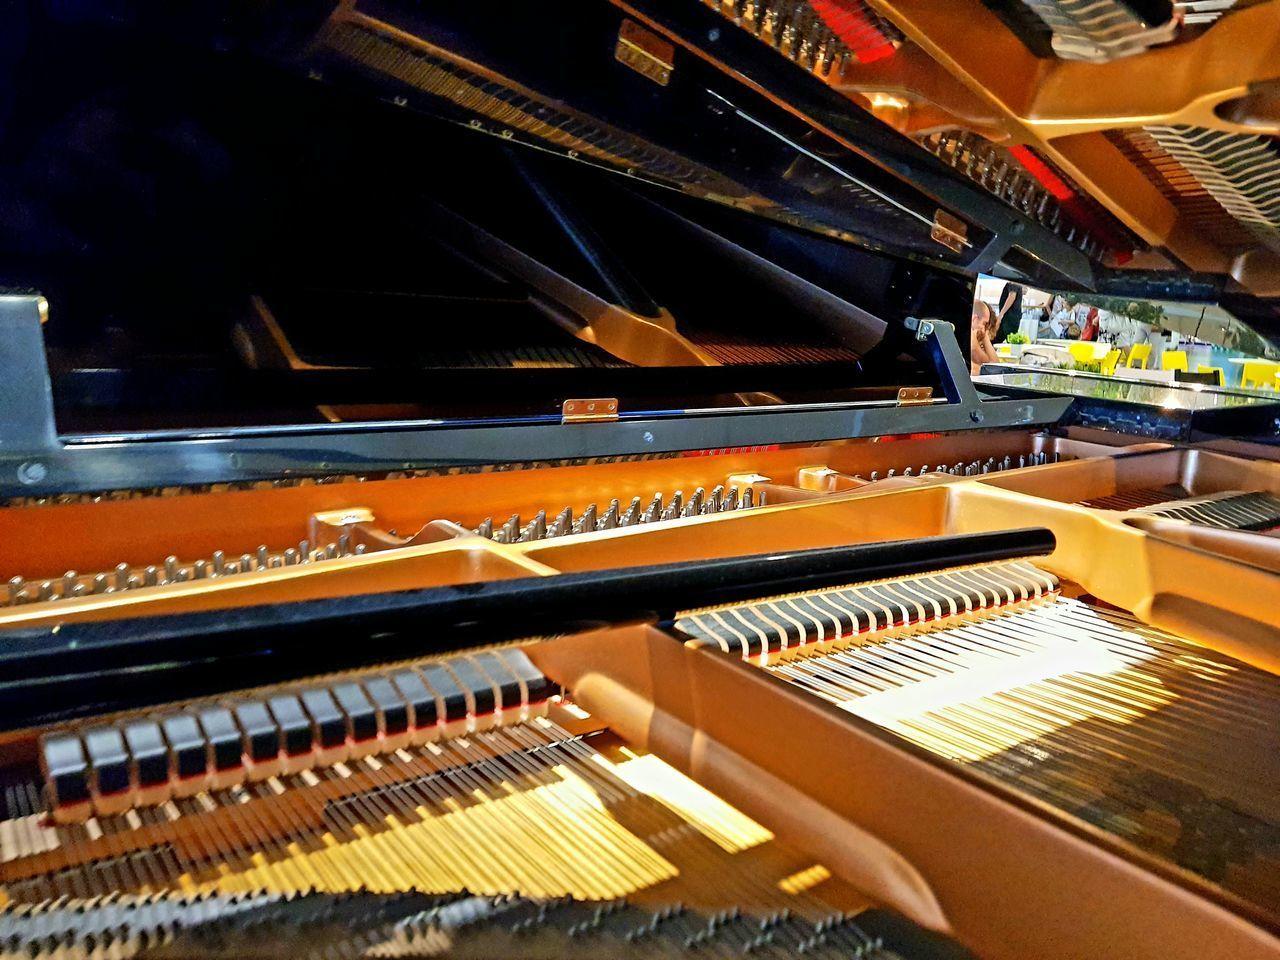 HIGH ANGLE VIEW OF PIANO KEYS AT NIGHTCLUB